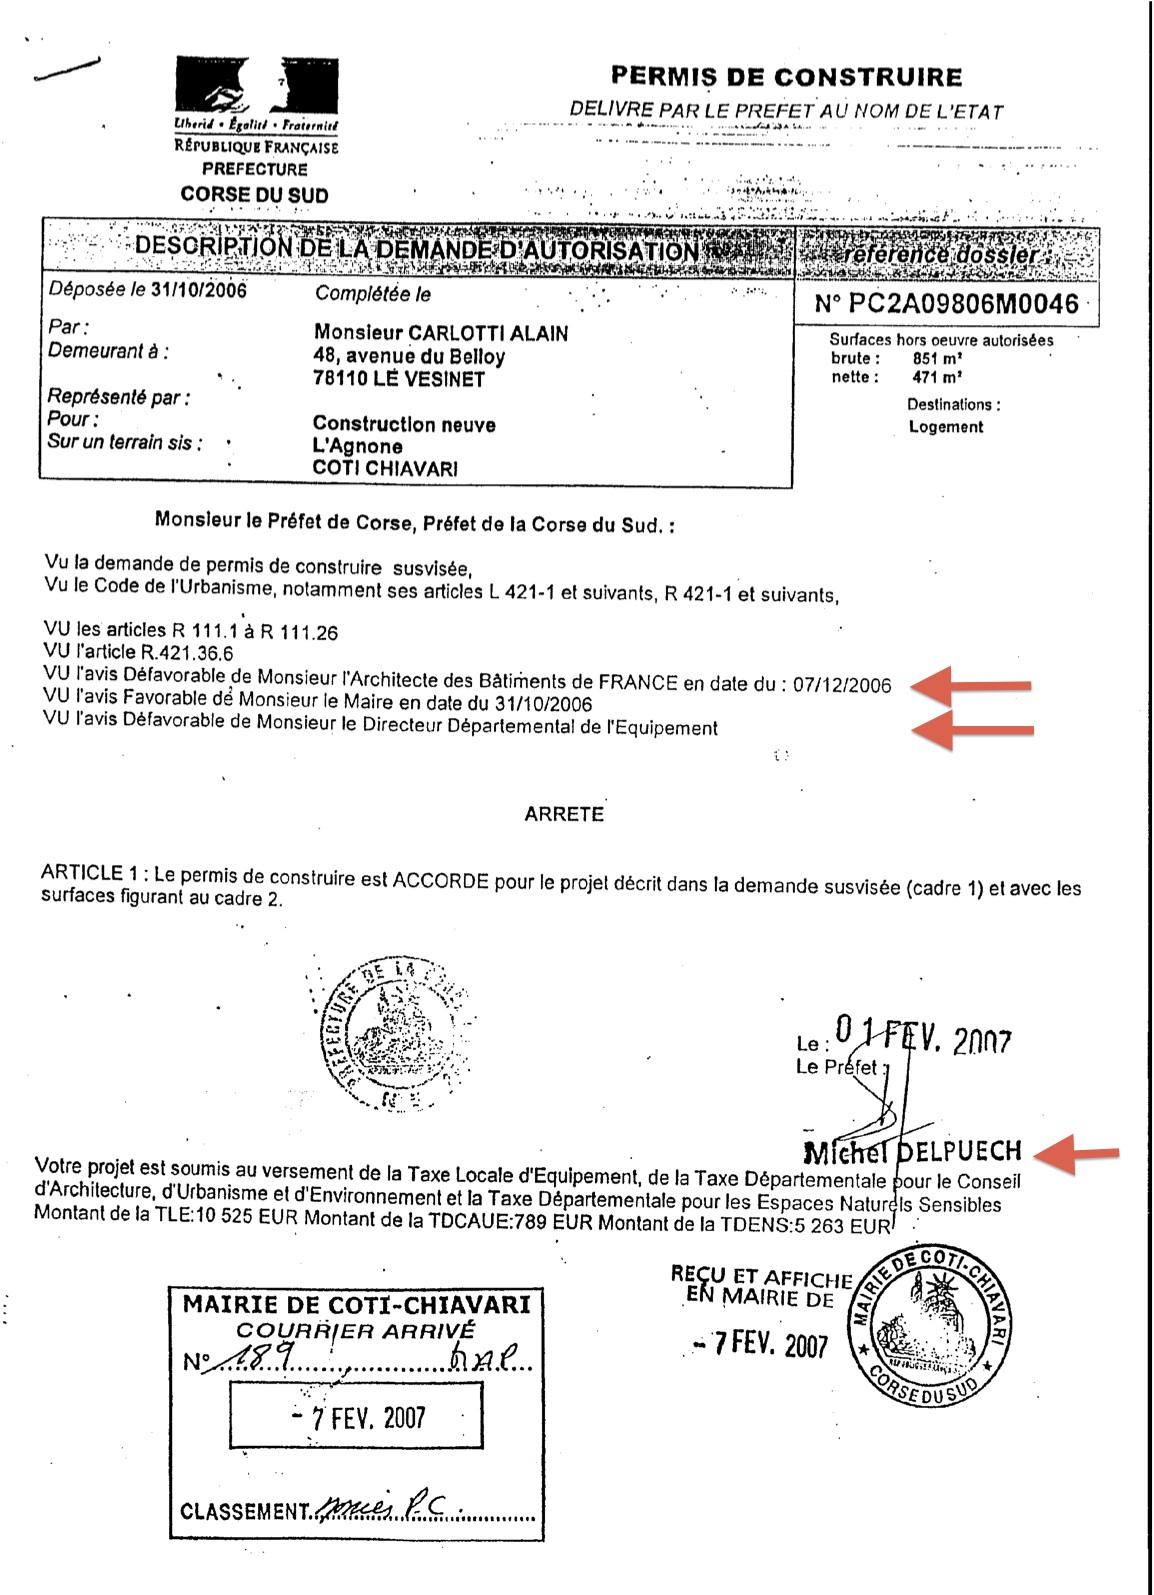 Commune de coti chjavari le permis de construire for Demande permis de construire